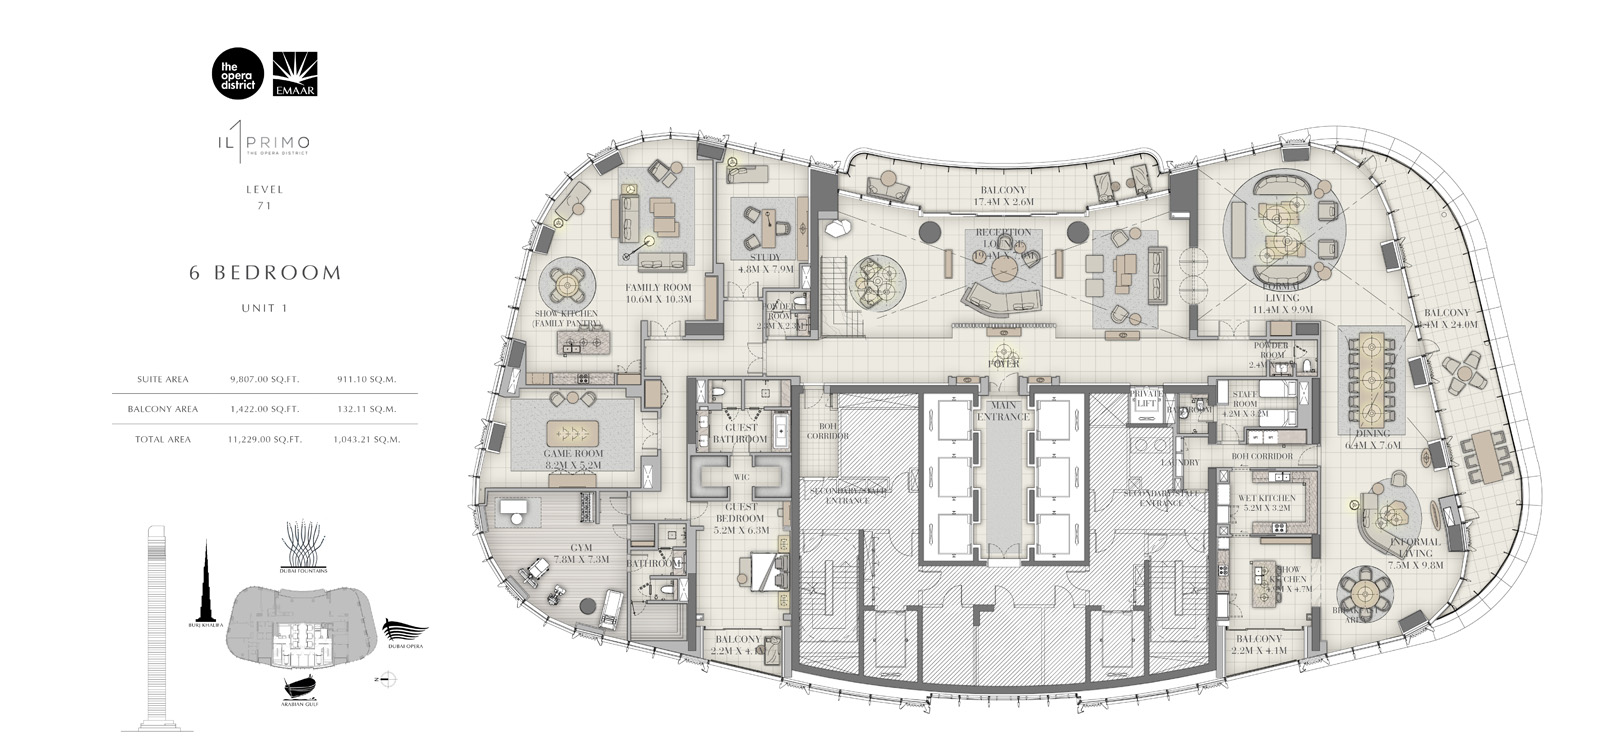 6 Bedroom Unit 1, Size 11229 sq ft